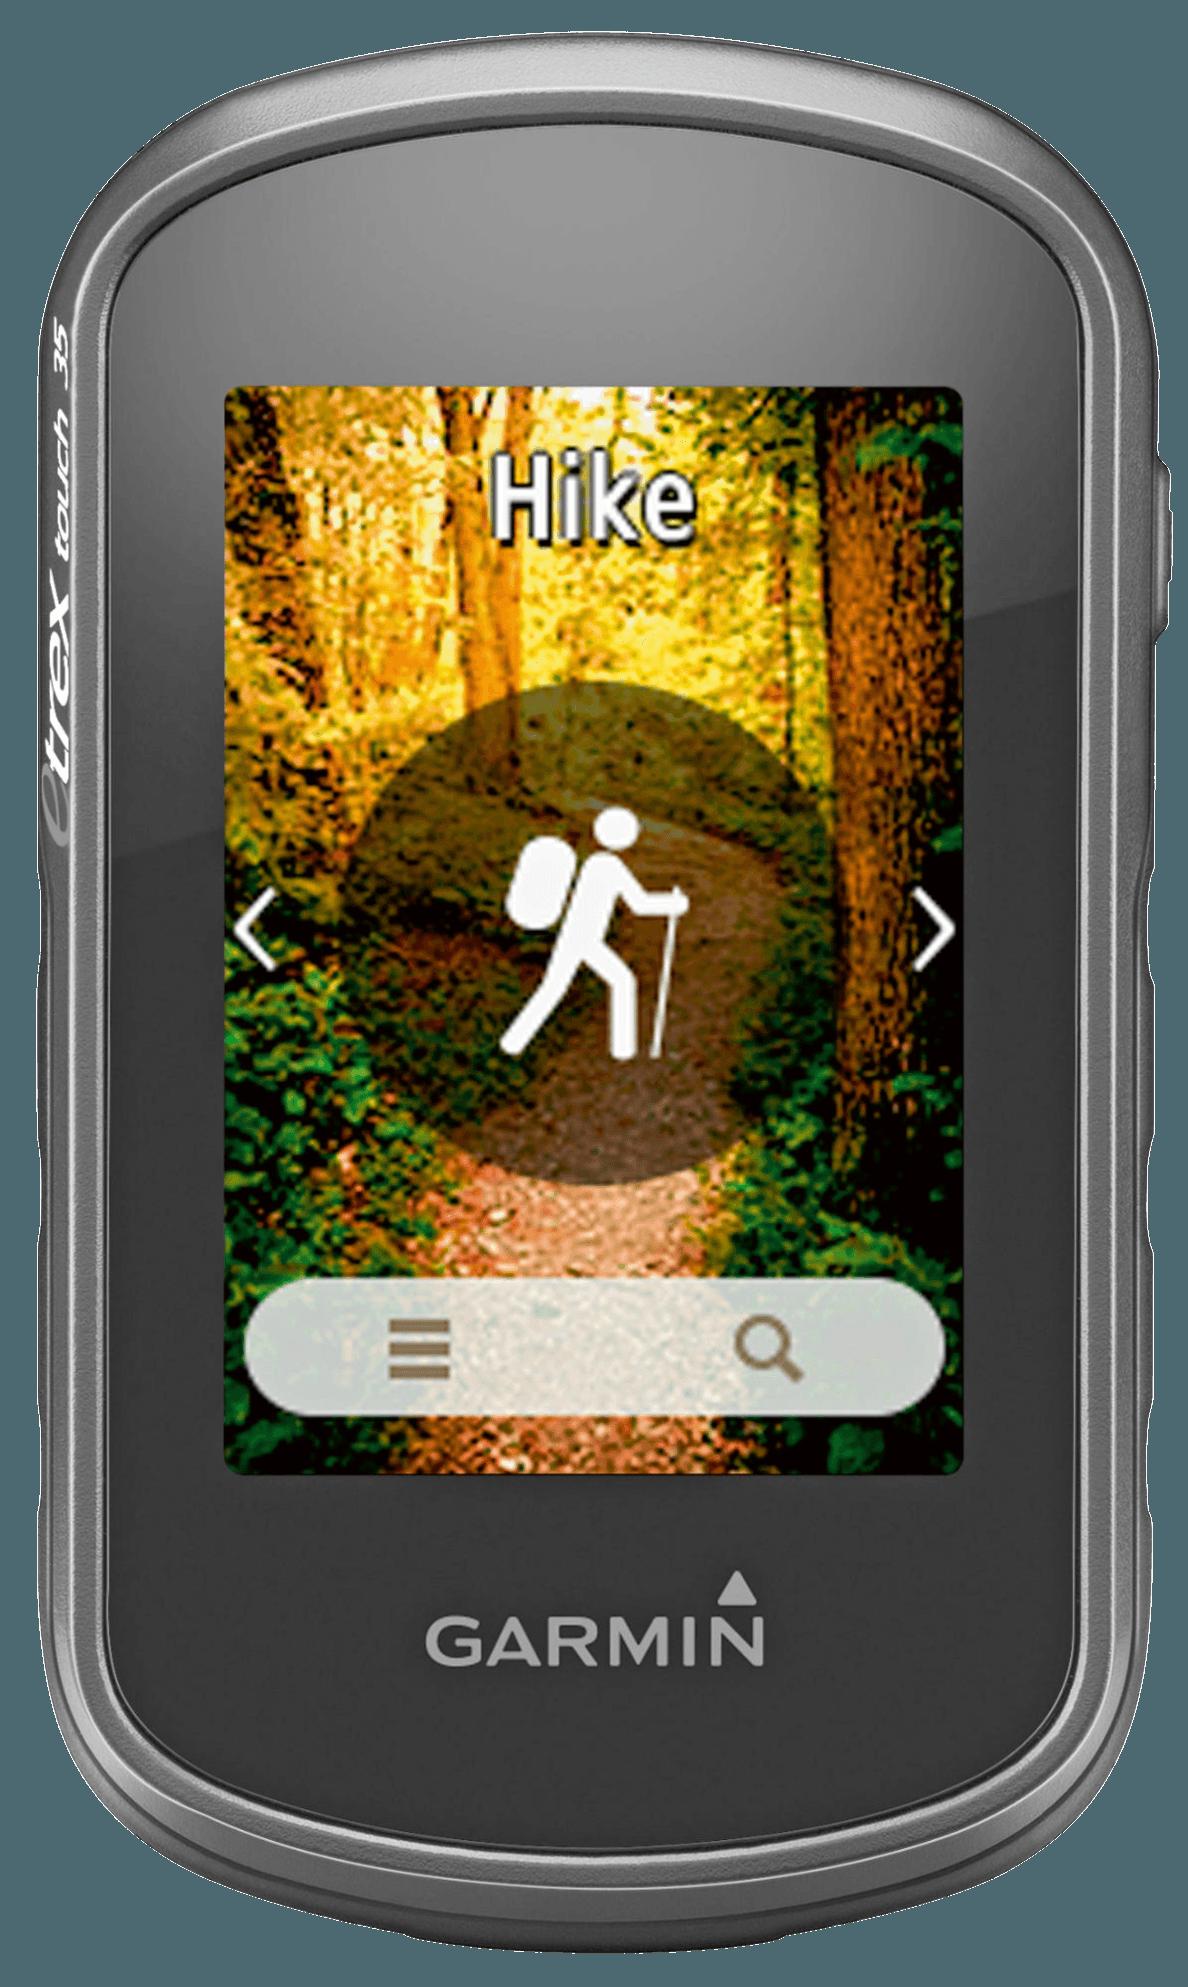 Garmin Etrex Touch 35 Ad Etrex Ad Garmin Touch Garmin Etrex Garmin Gps